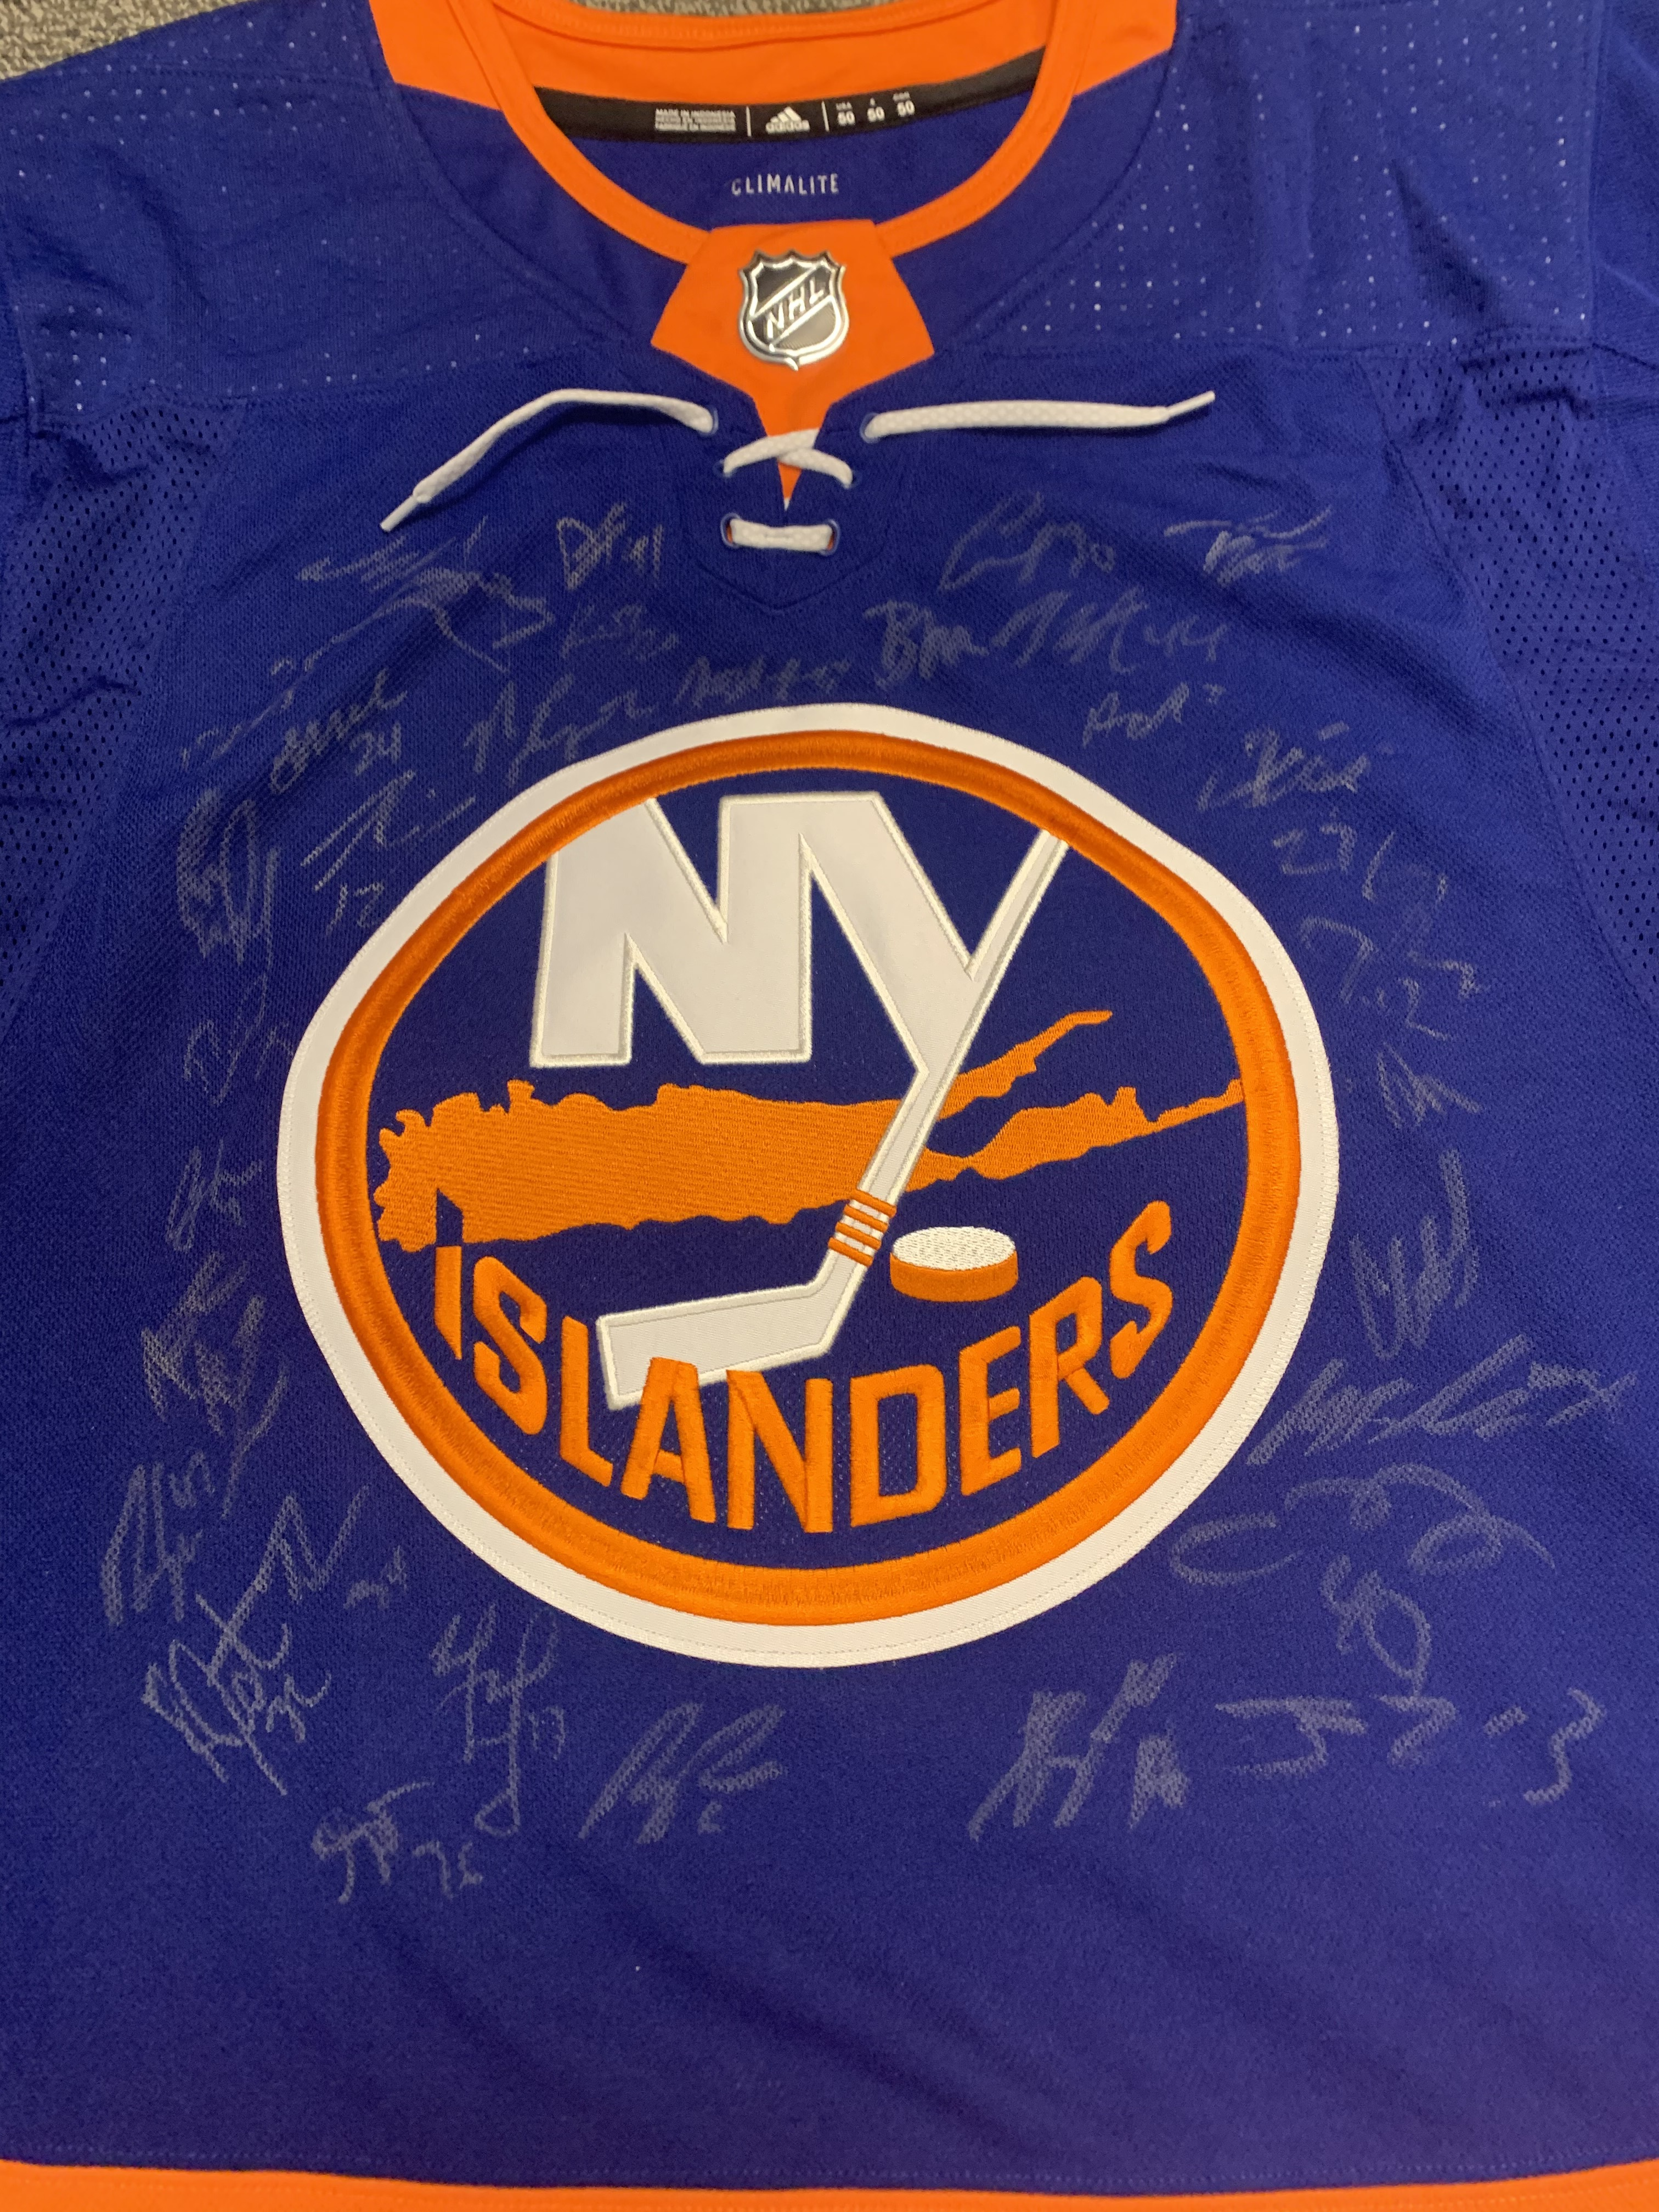 Islanders autographs